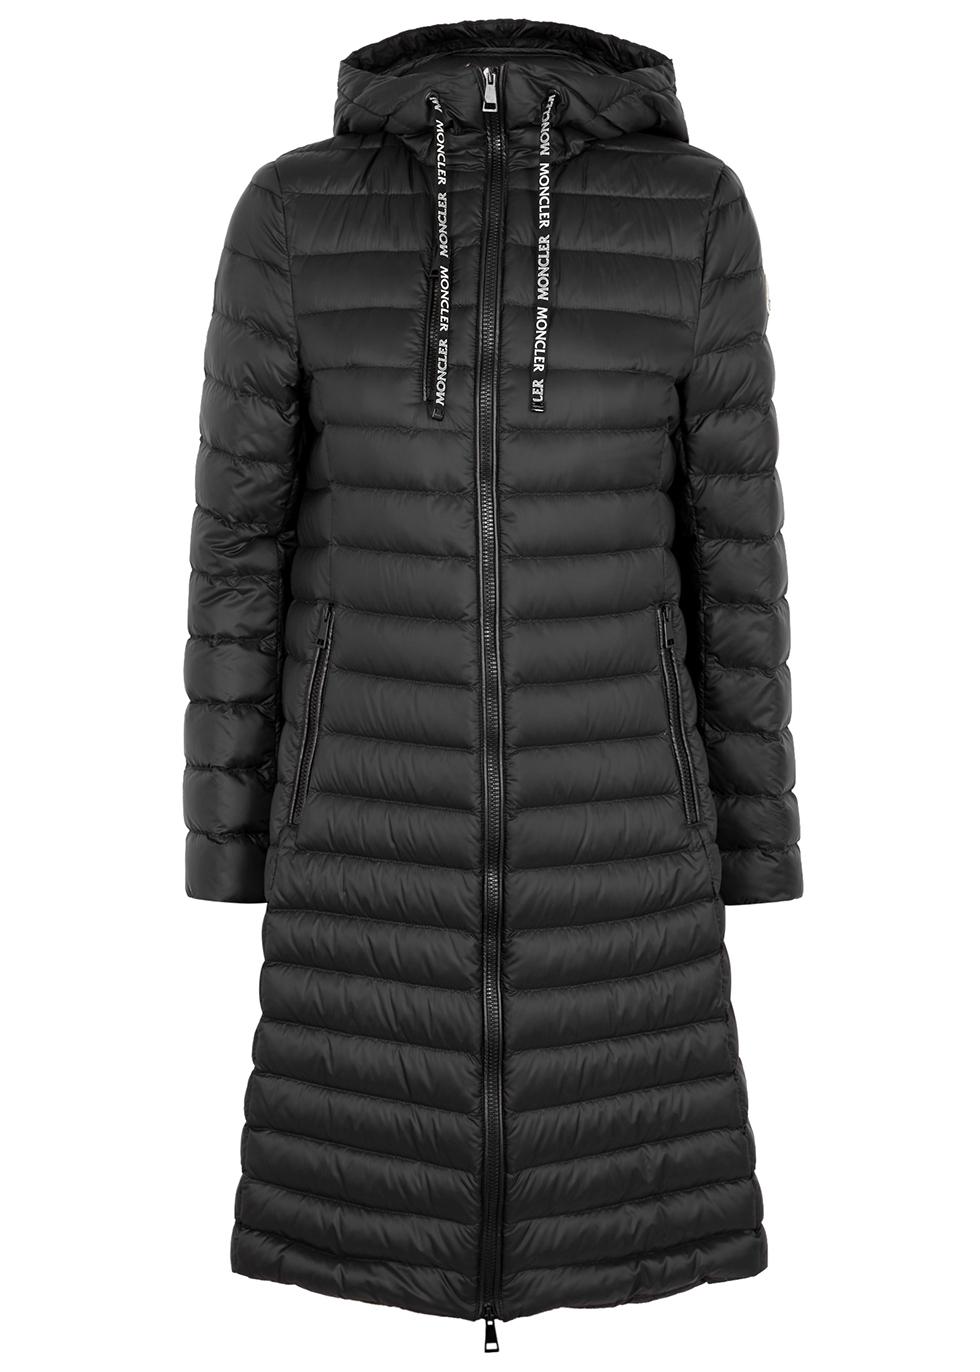 02aef1fb125e9 Moncler - Designer Jackets, Coats, Gilets - Harvey Nichols